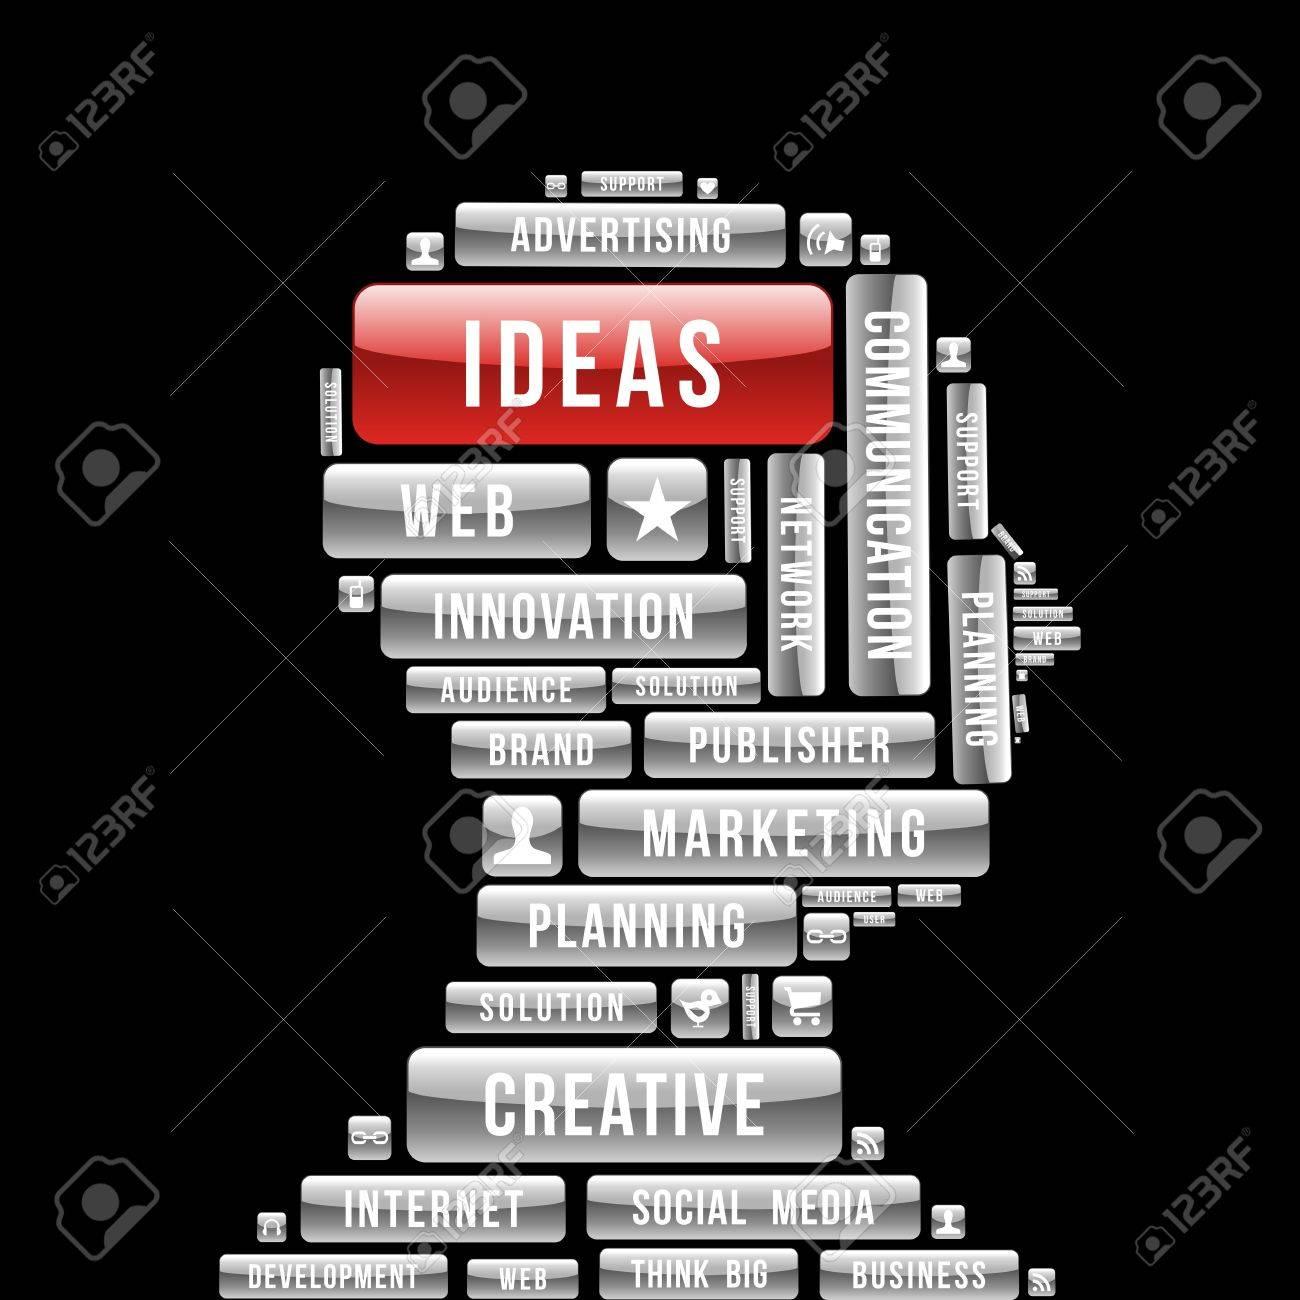 Marketing ideas human head  glossy web buttons. Stock Vector - 21280181